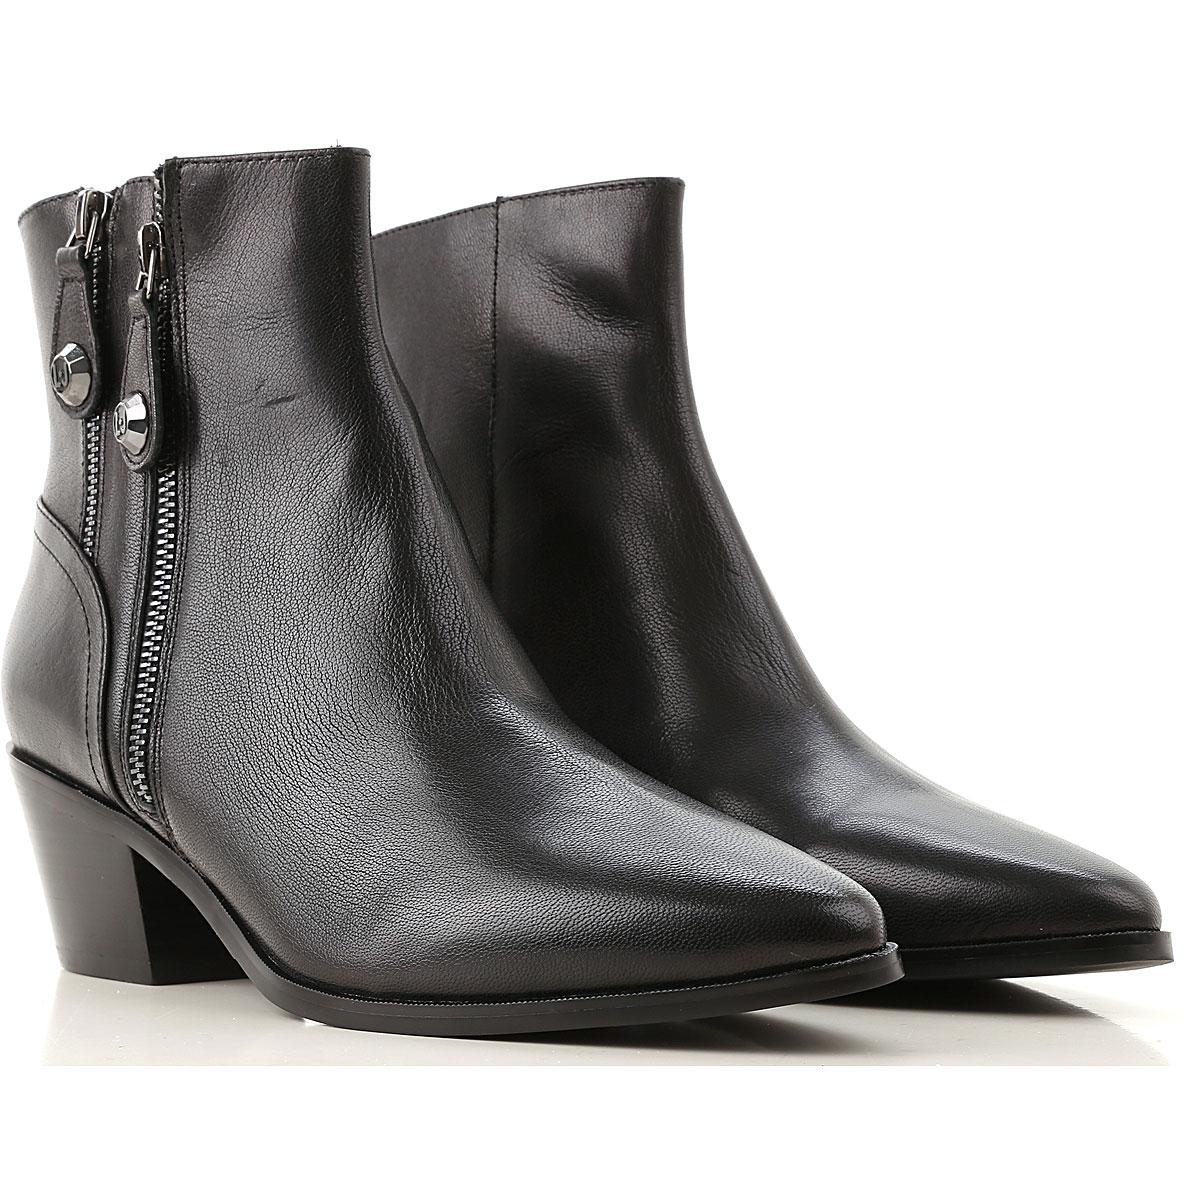 Liu Jo Boots for Women, Booties On Sale, Black, Leather, 2019, 10 6 7 8 9